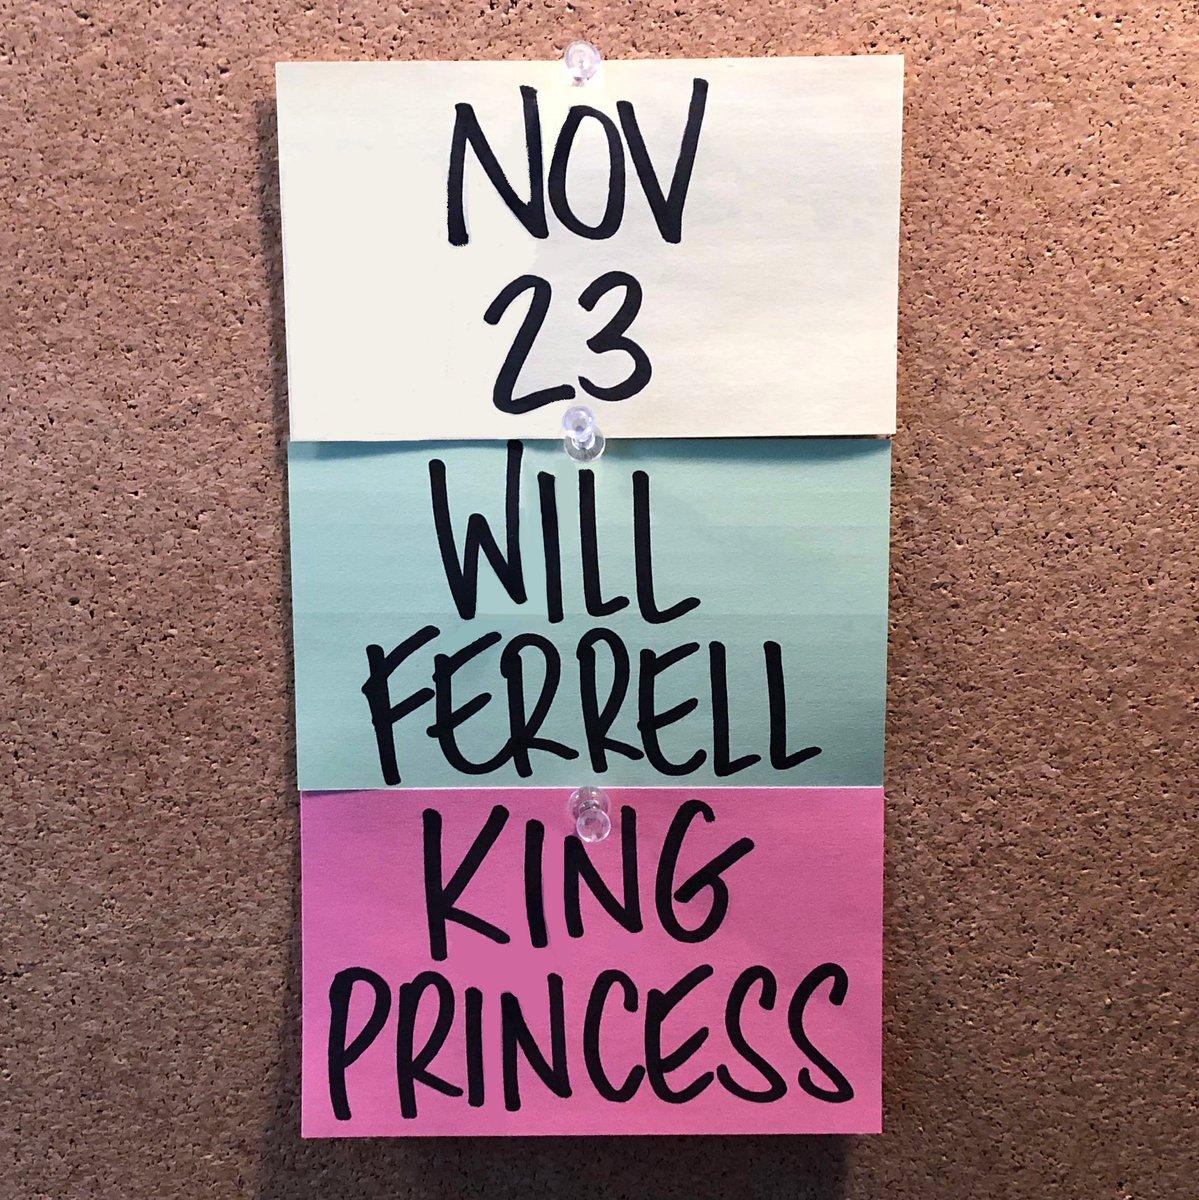 ‼️ November 23 ‼️ Will Ferrell @KingPrincess69